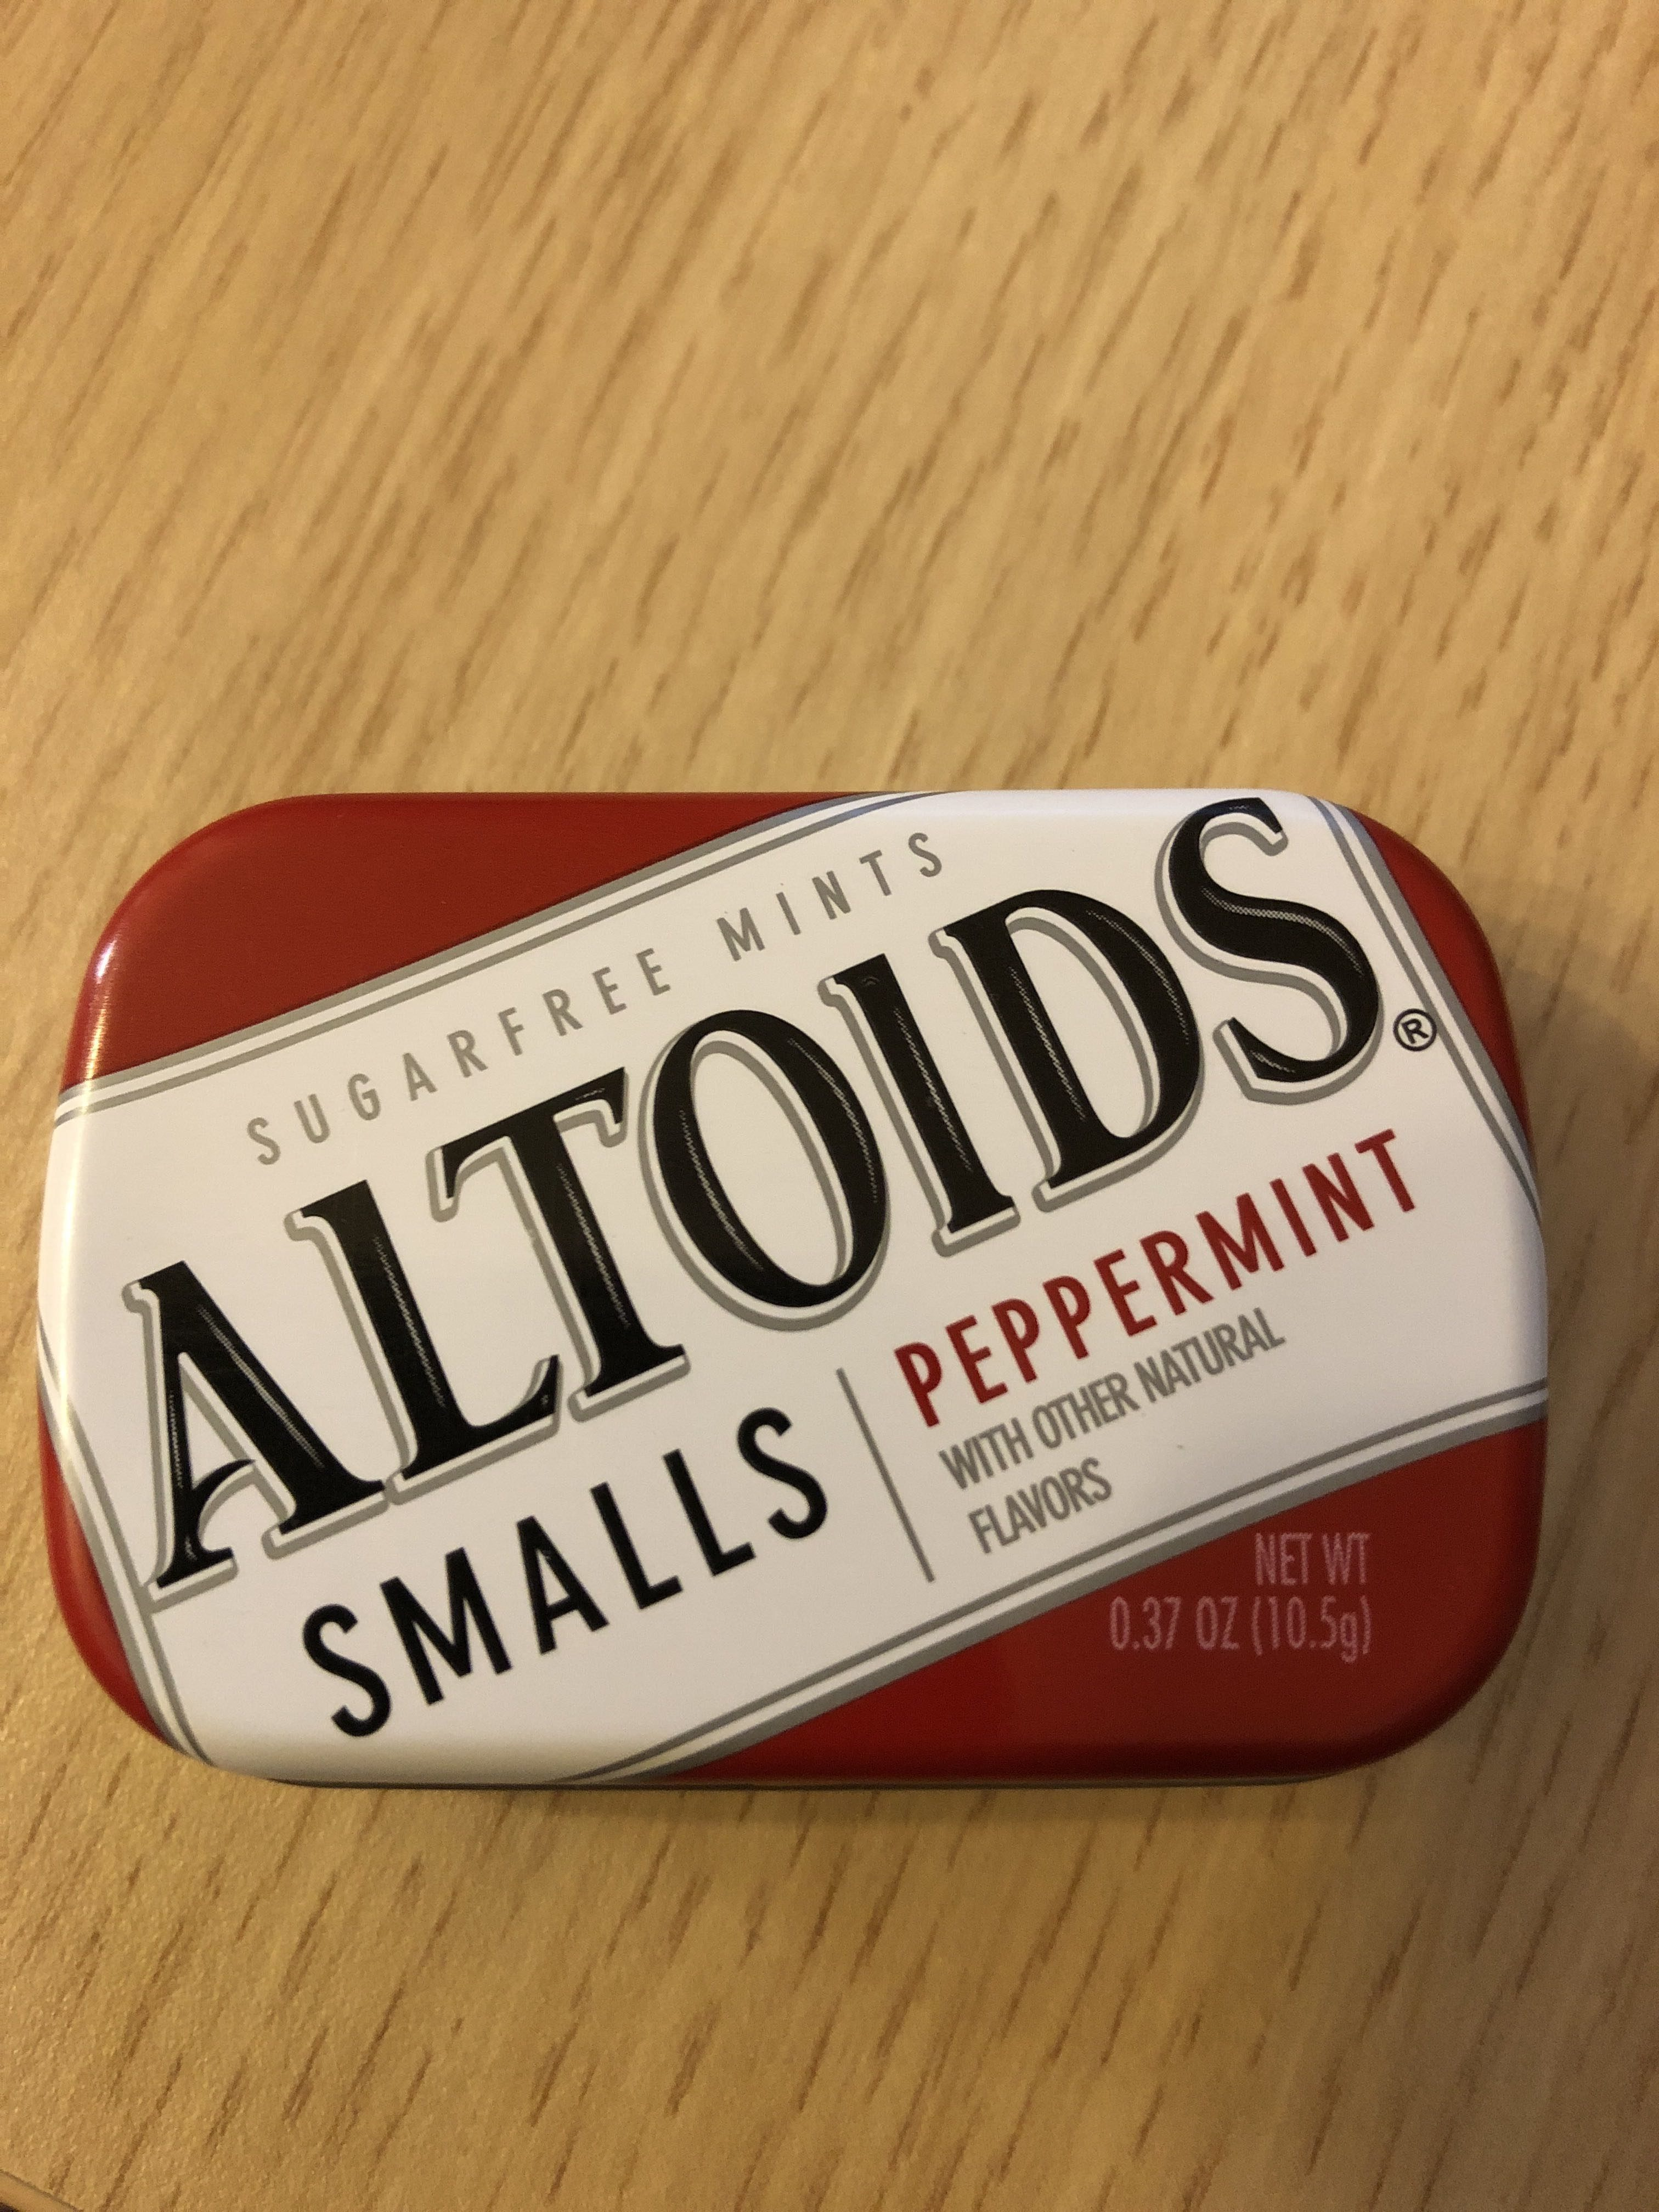 Peppermint sugarfree mints, peppermint - Produit - fr